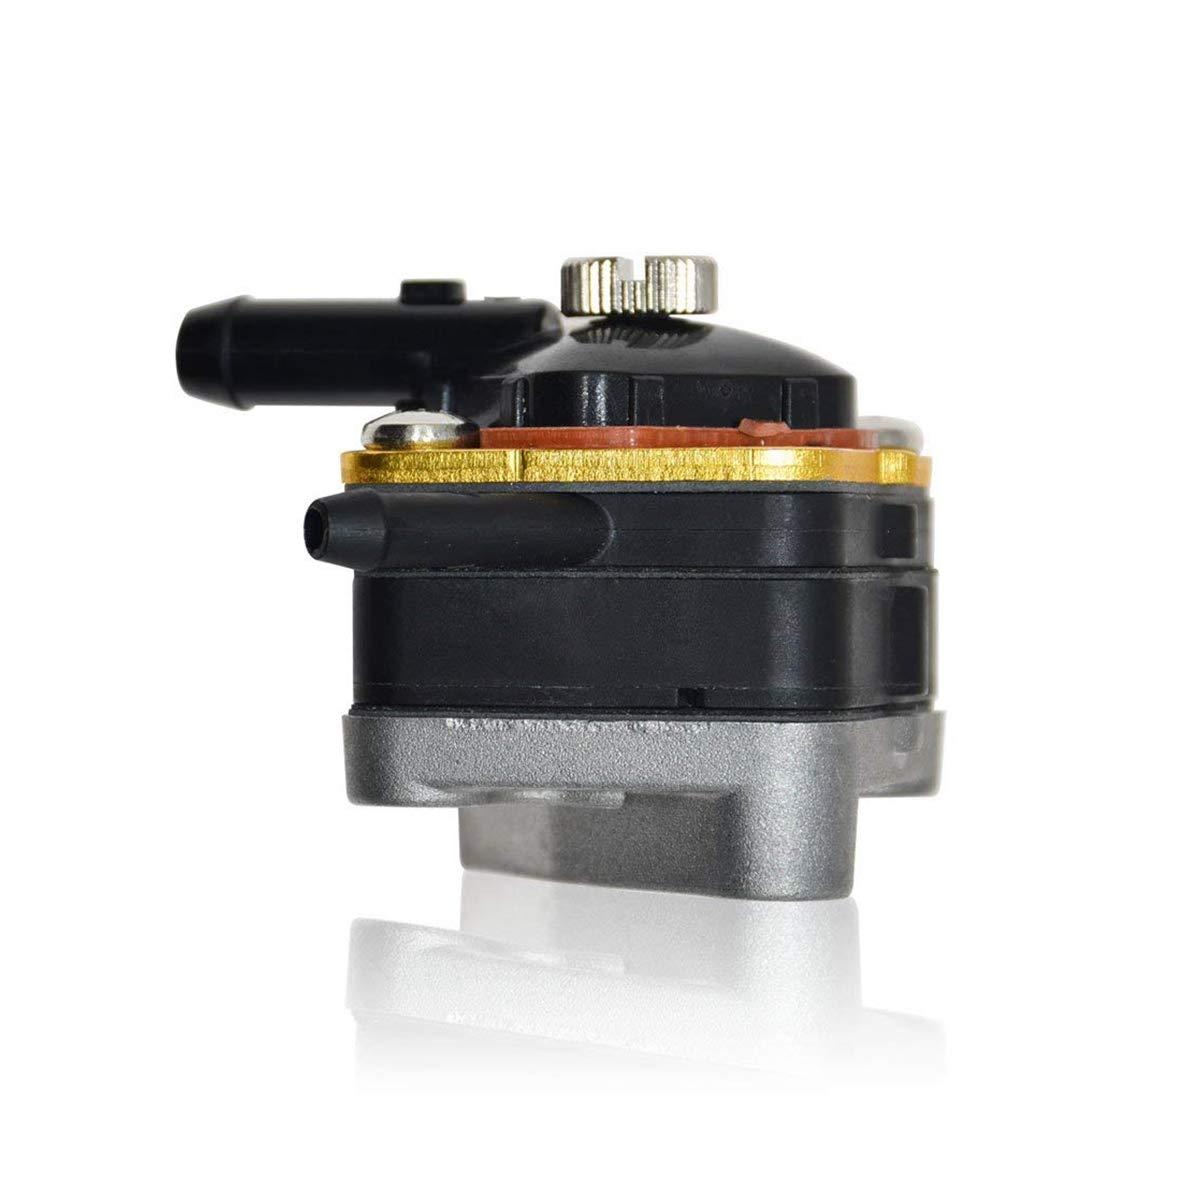 Amhousejoy 18-7350 Fuel Pump Fits Johnson Evinrude 397839 391638 397274 395091 6hp 8hp 9.9hp 15hp Engine Motor Includes Gasket Fuel Parts